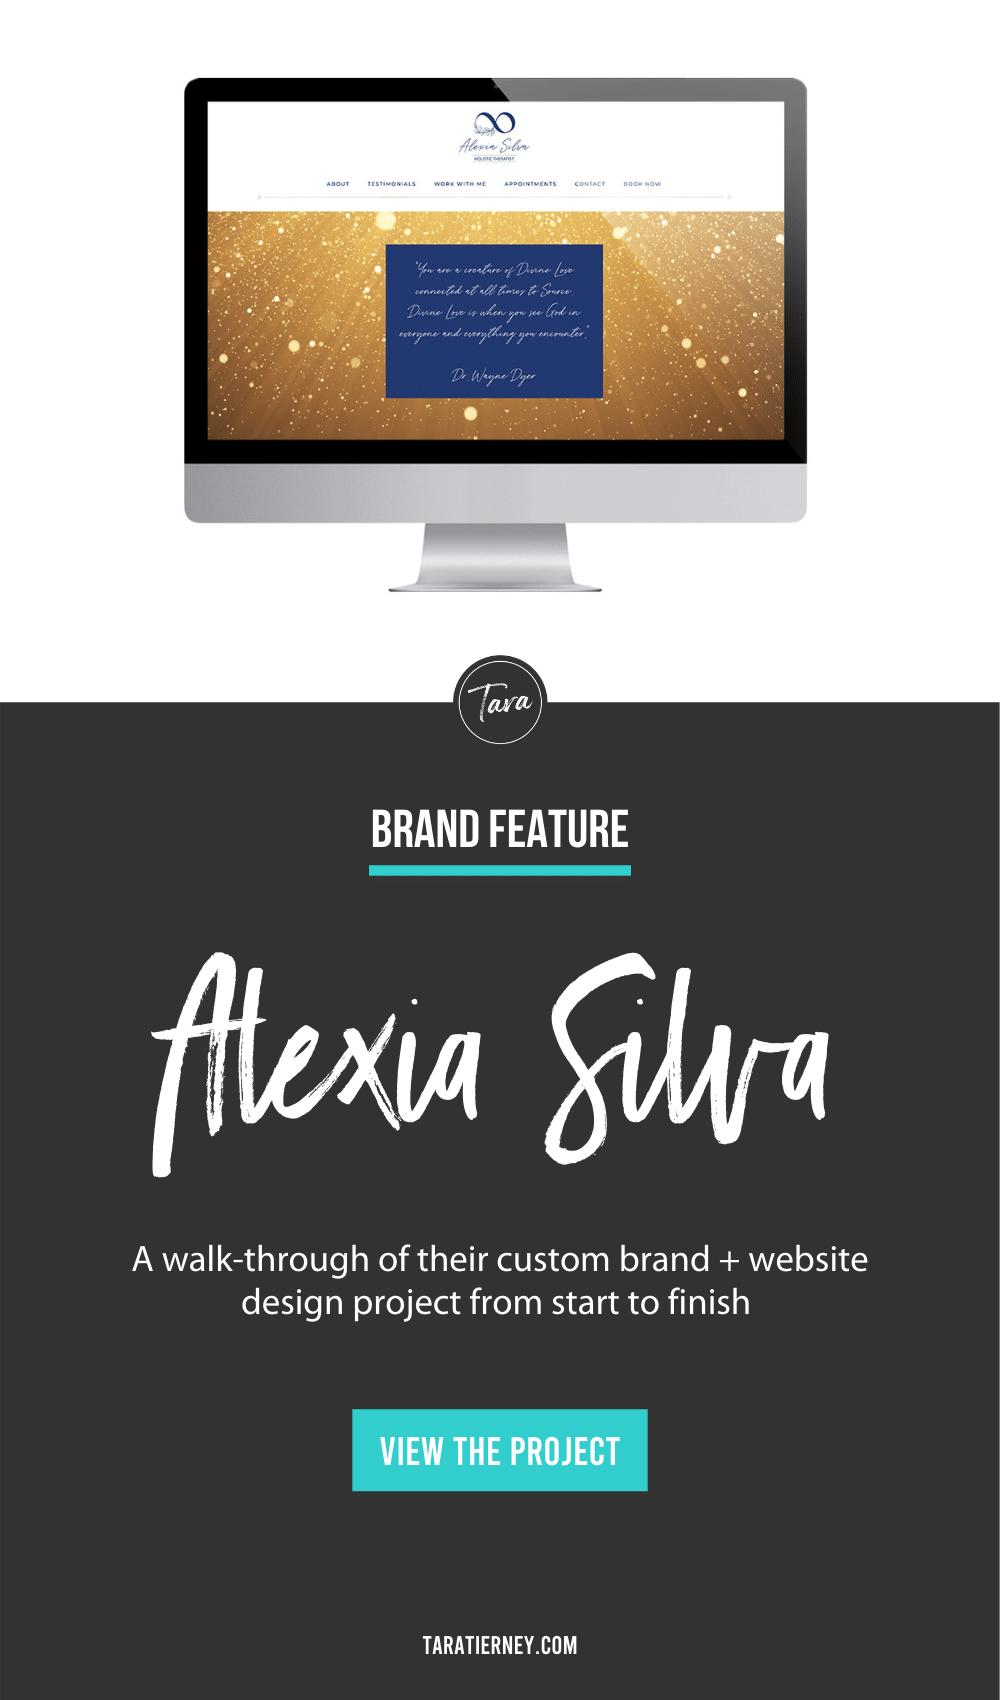 Alexia Silva Branding + Website Design Project